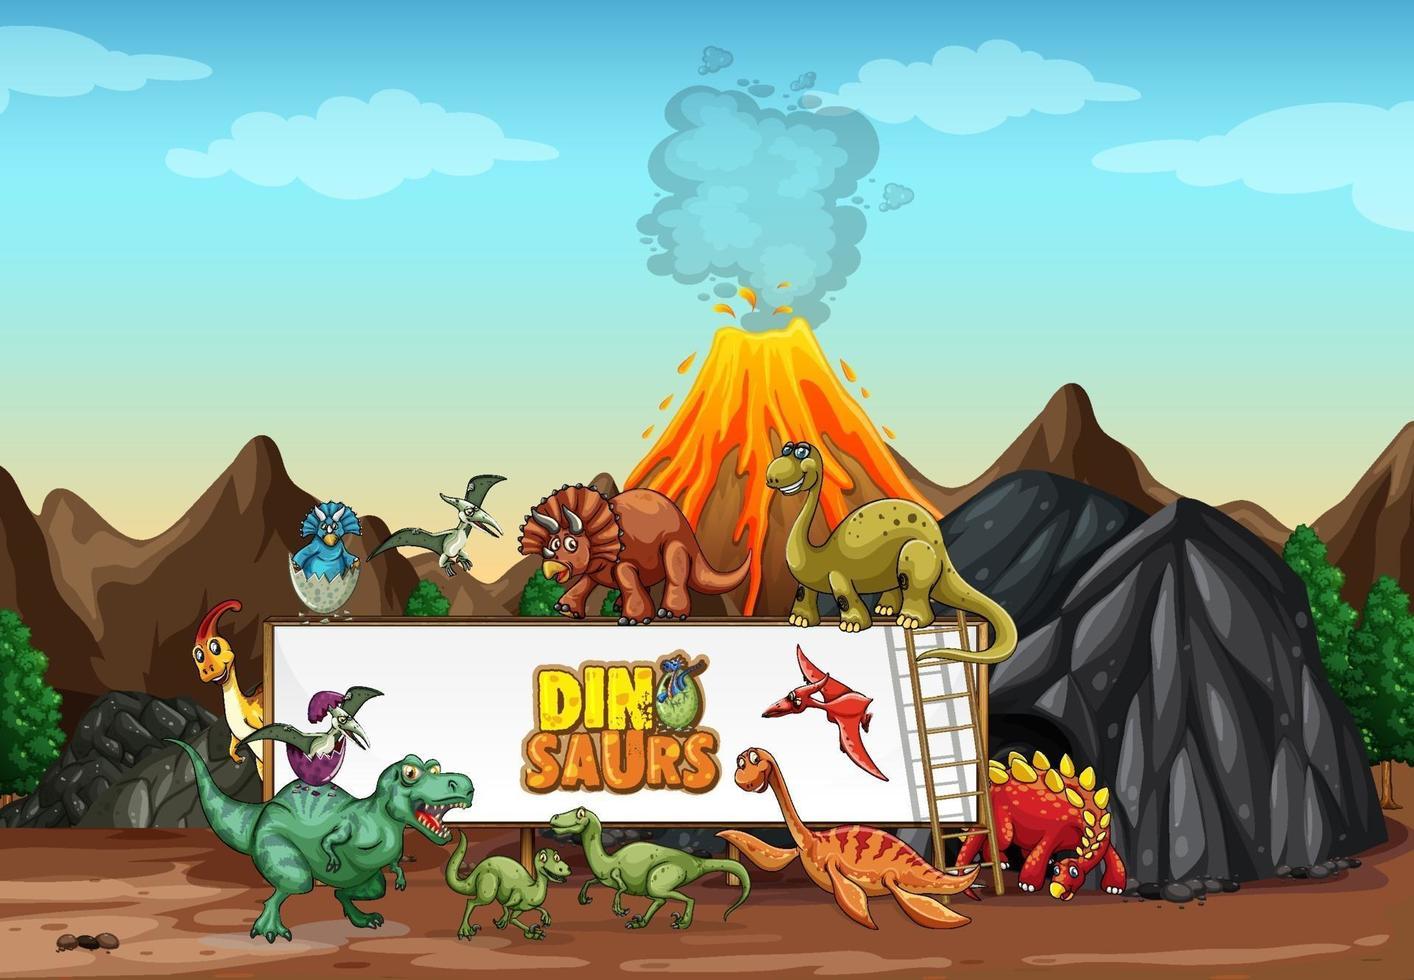 dinosaurier seriefigur i natur scen vektor